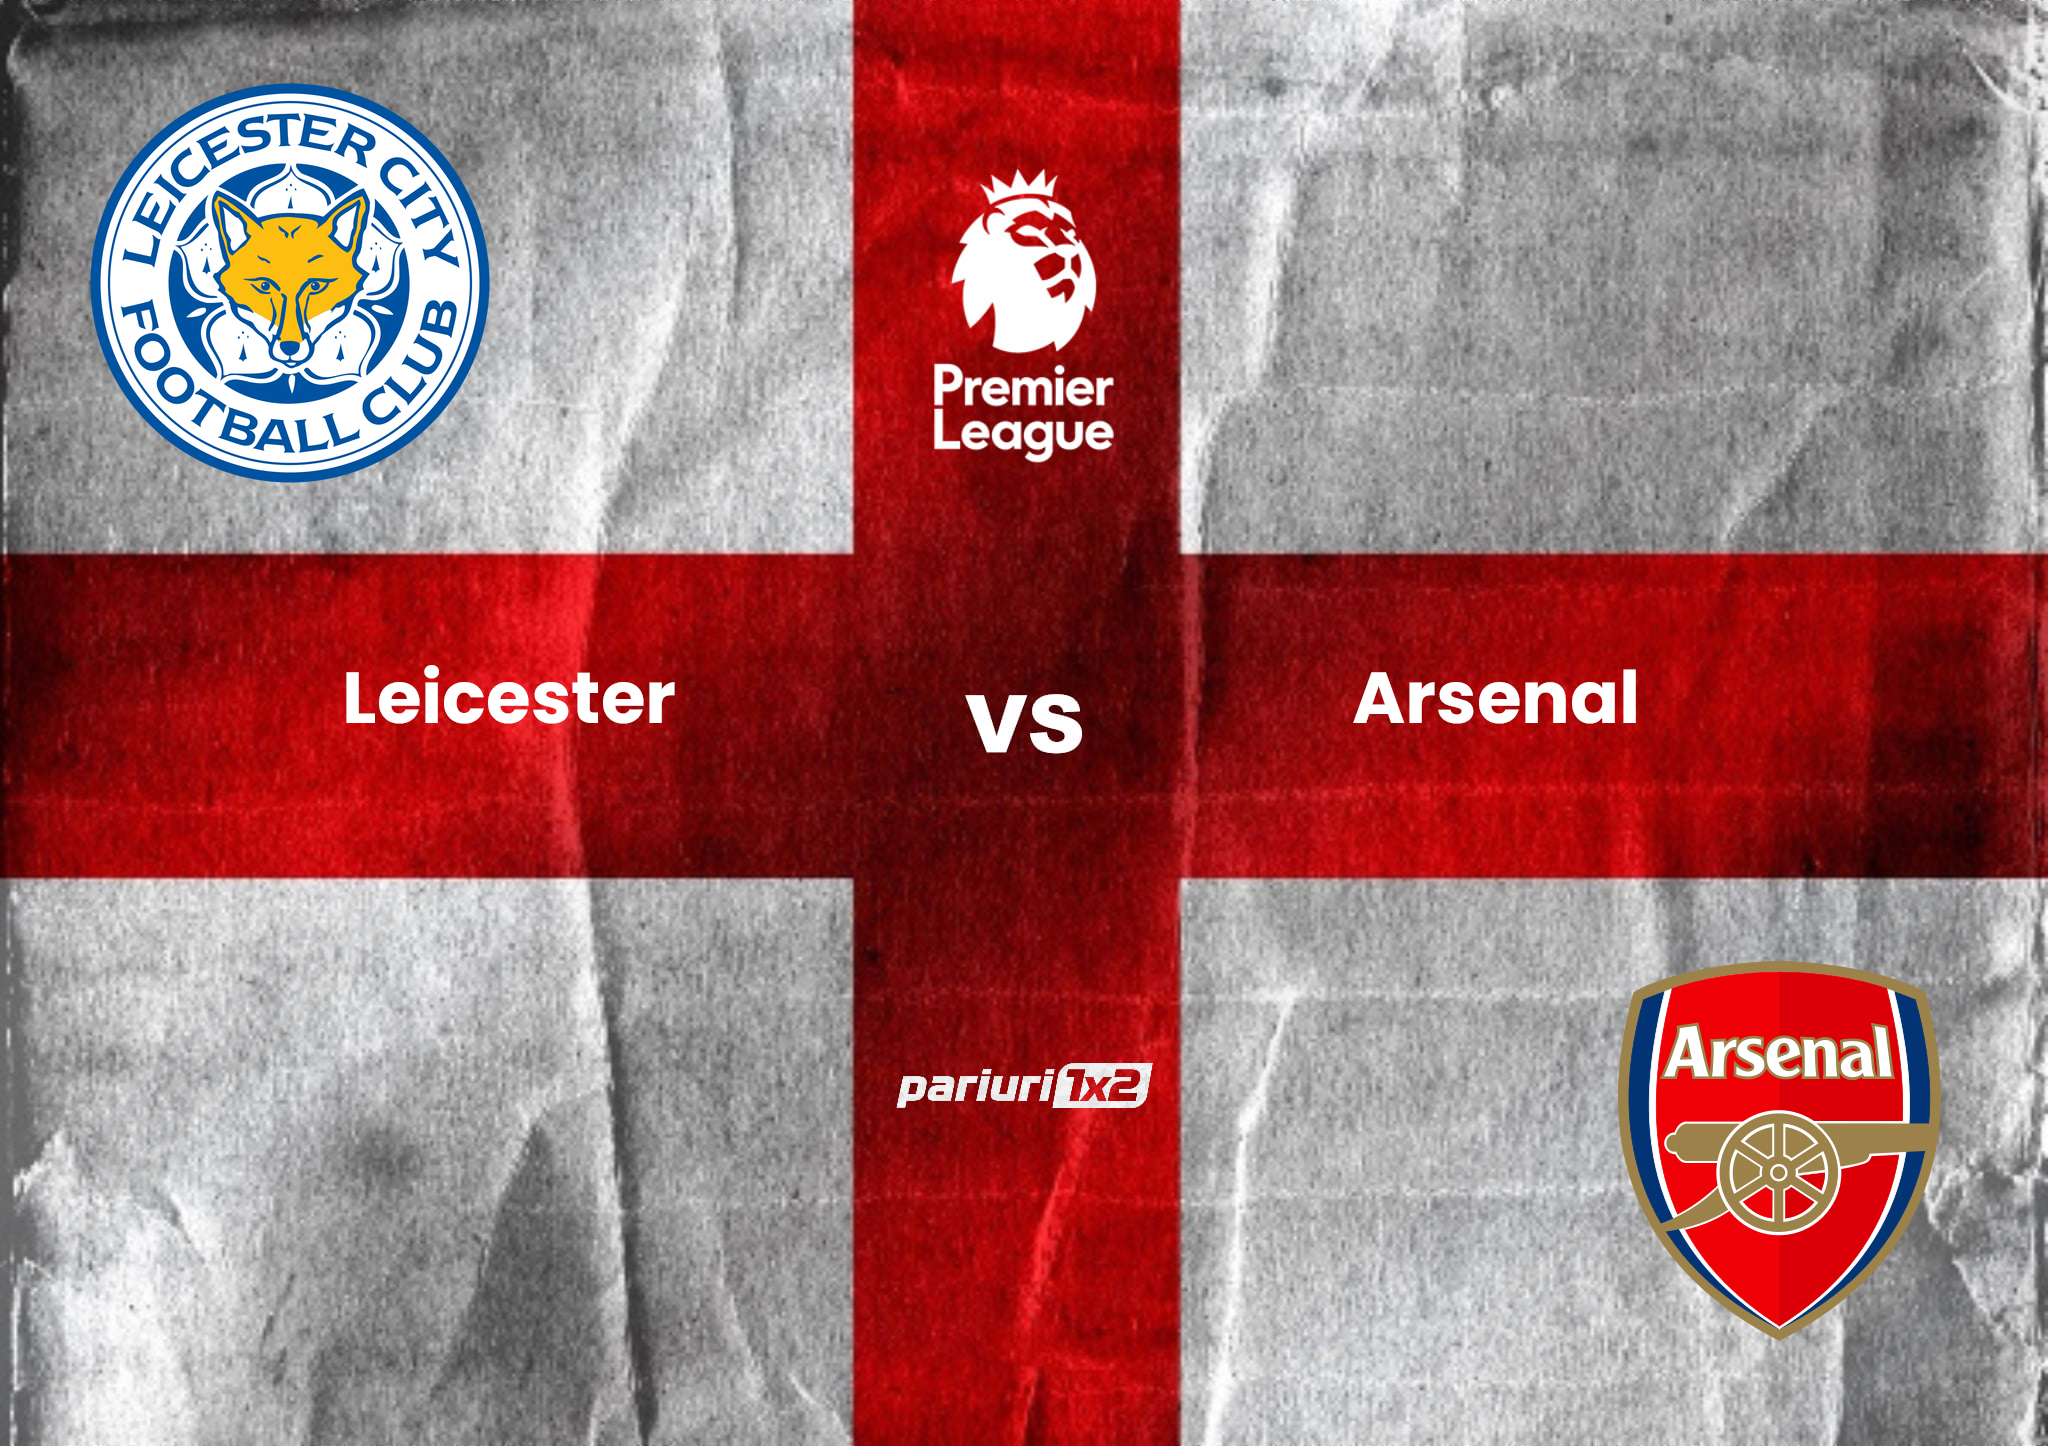 Leicester - Arsenal